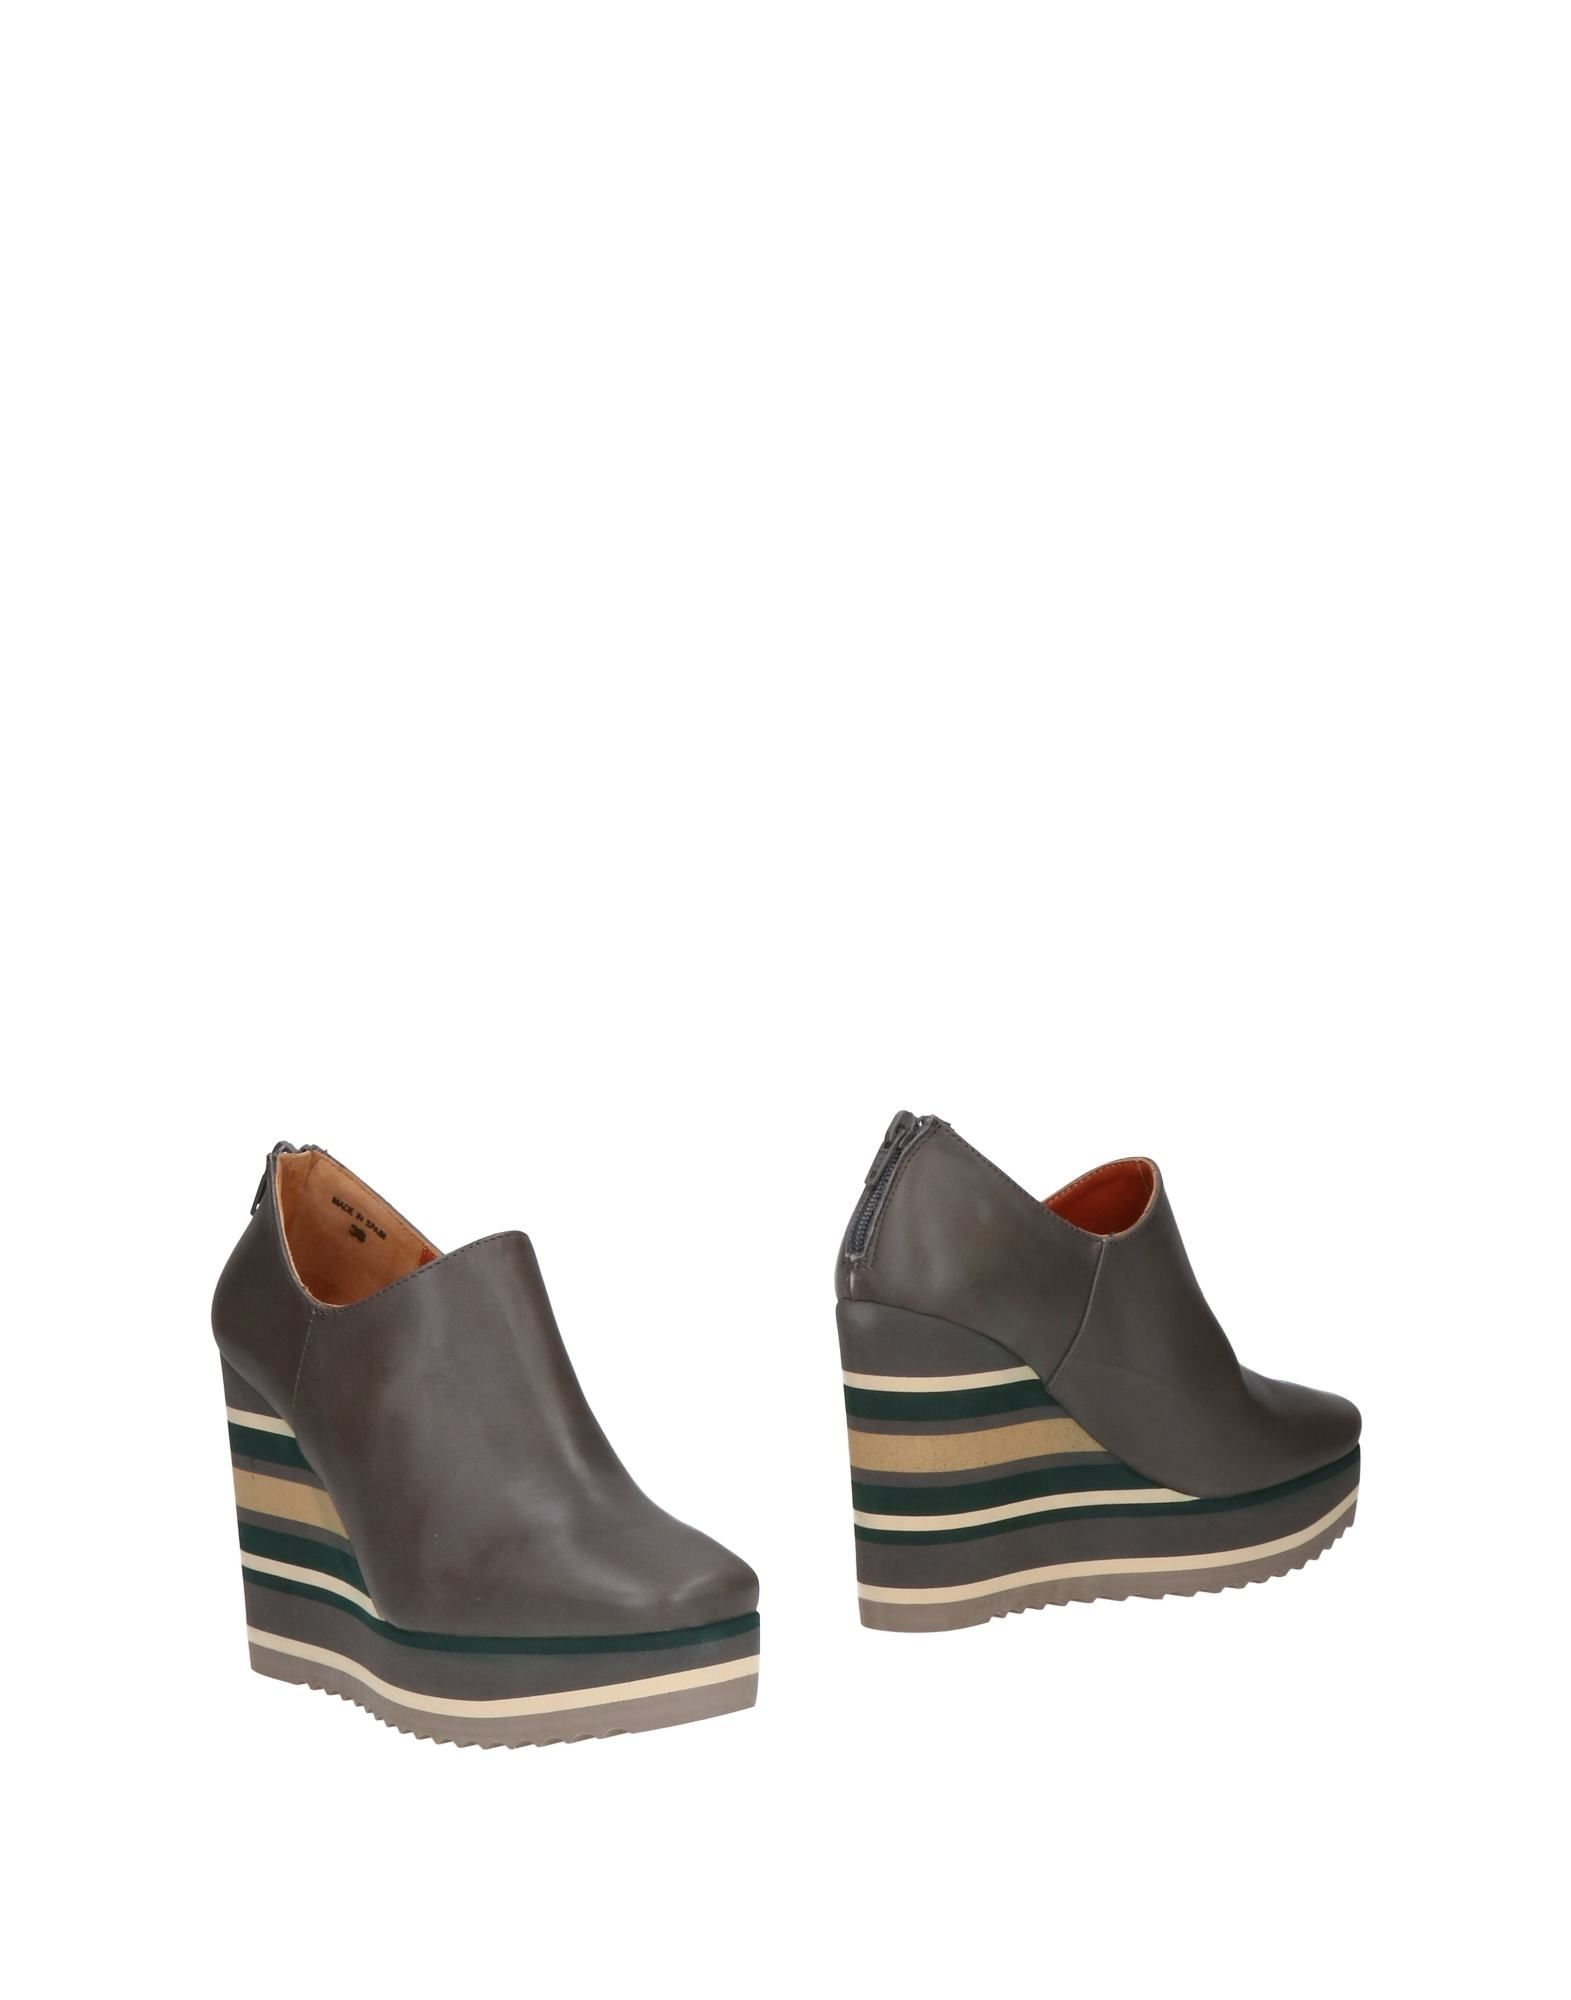 Gut um billige Stiefelette Schuhe zu tragenPaloma Barceló Stiefelette billige Damen  11501201NM a70237